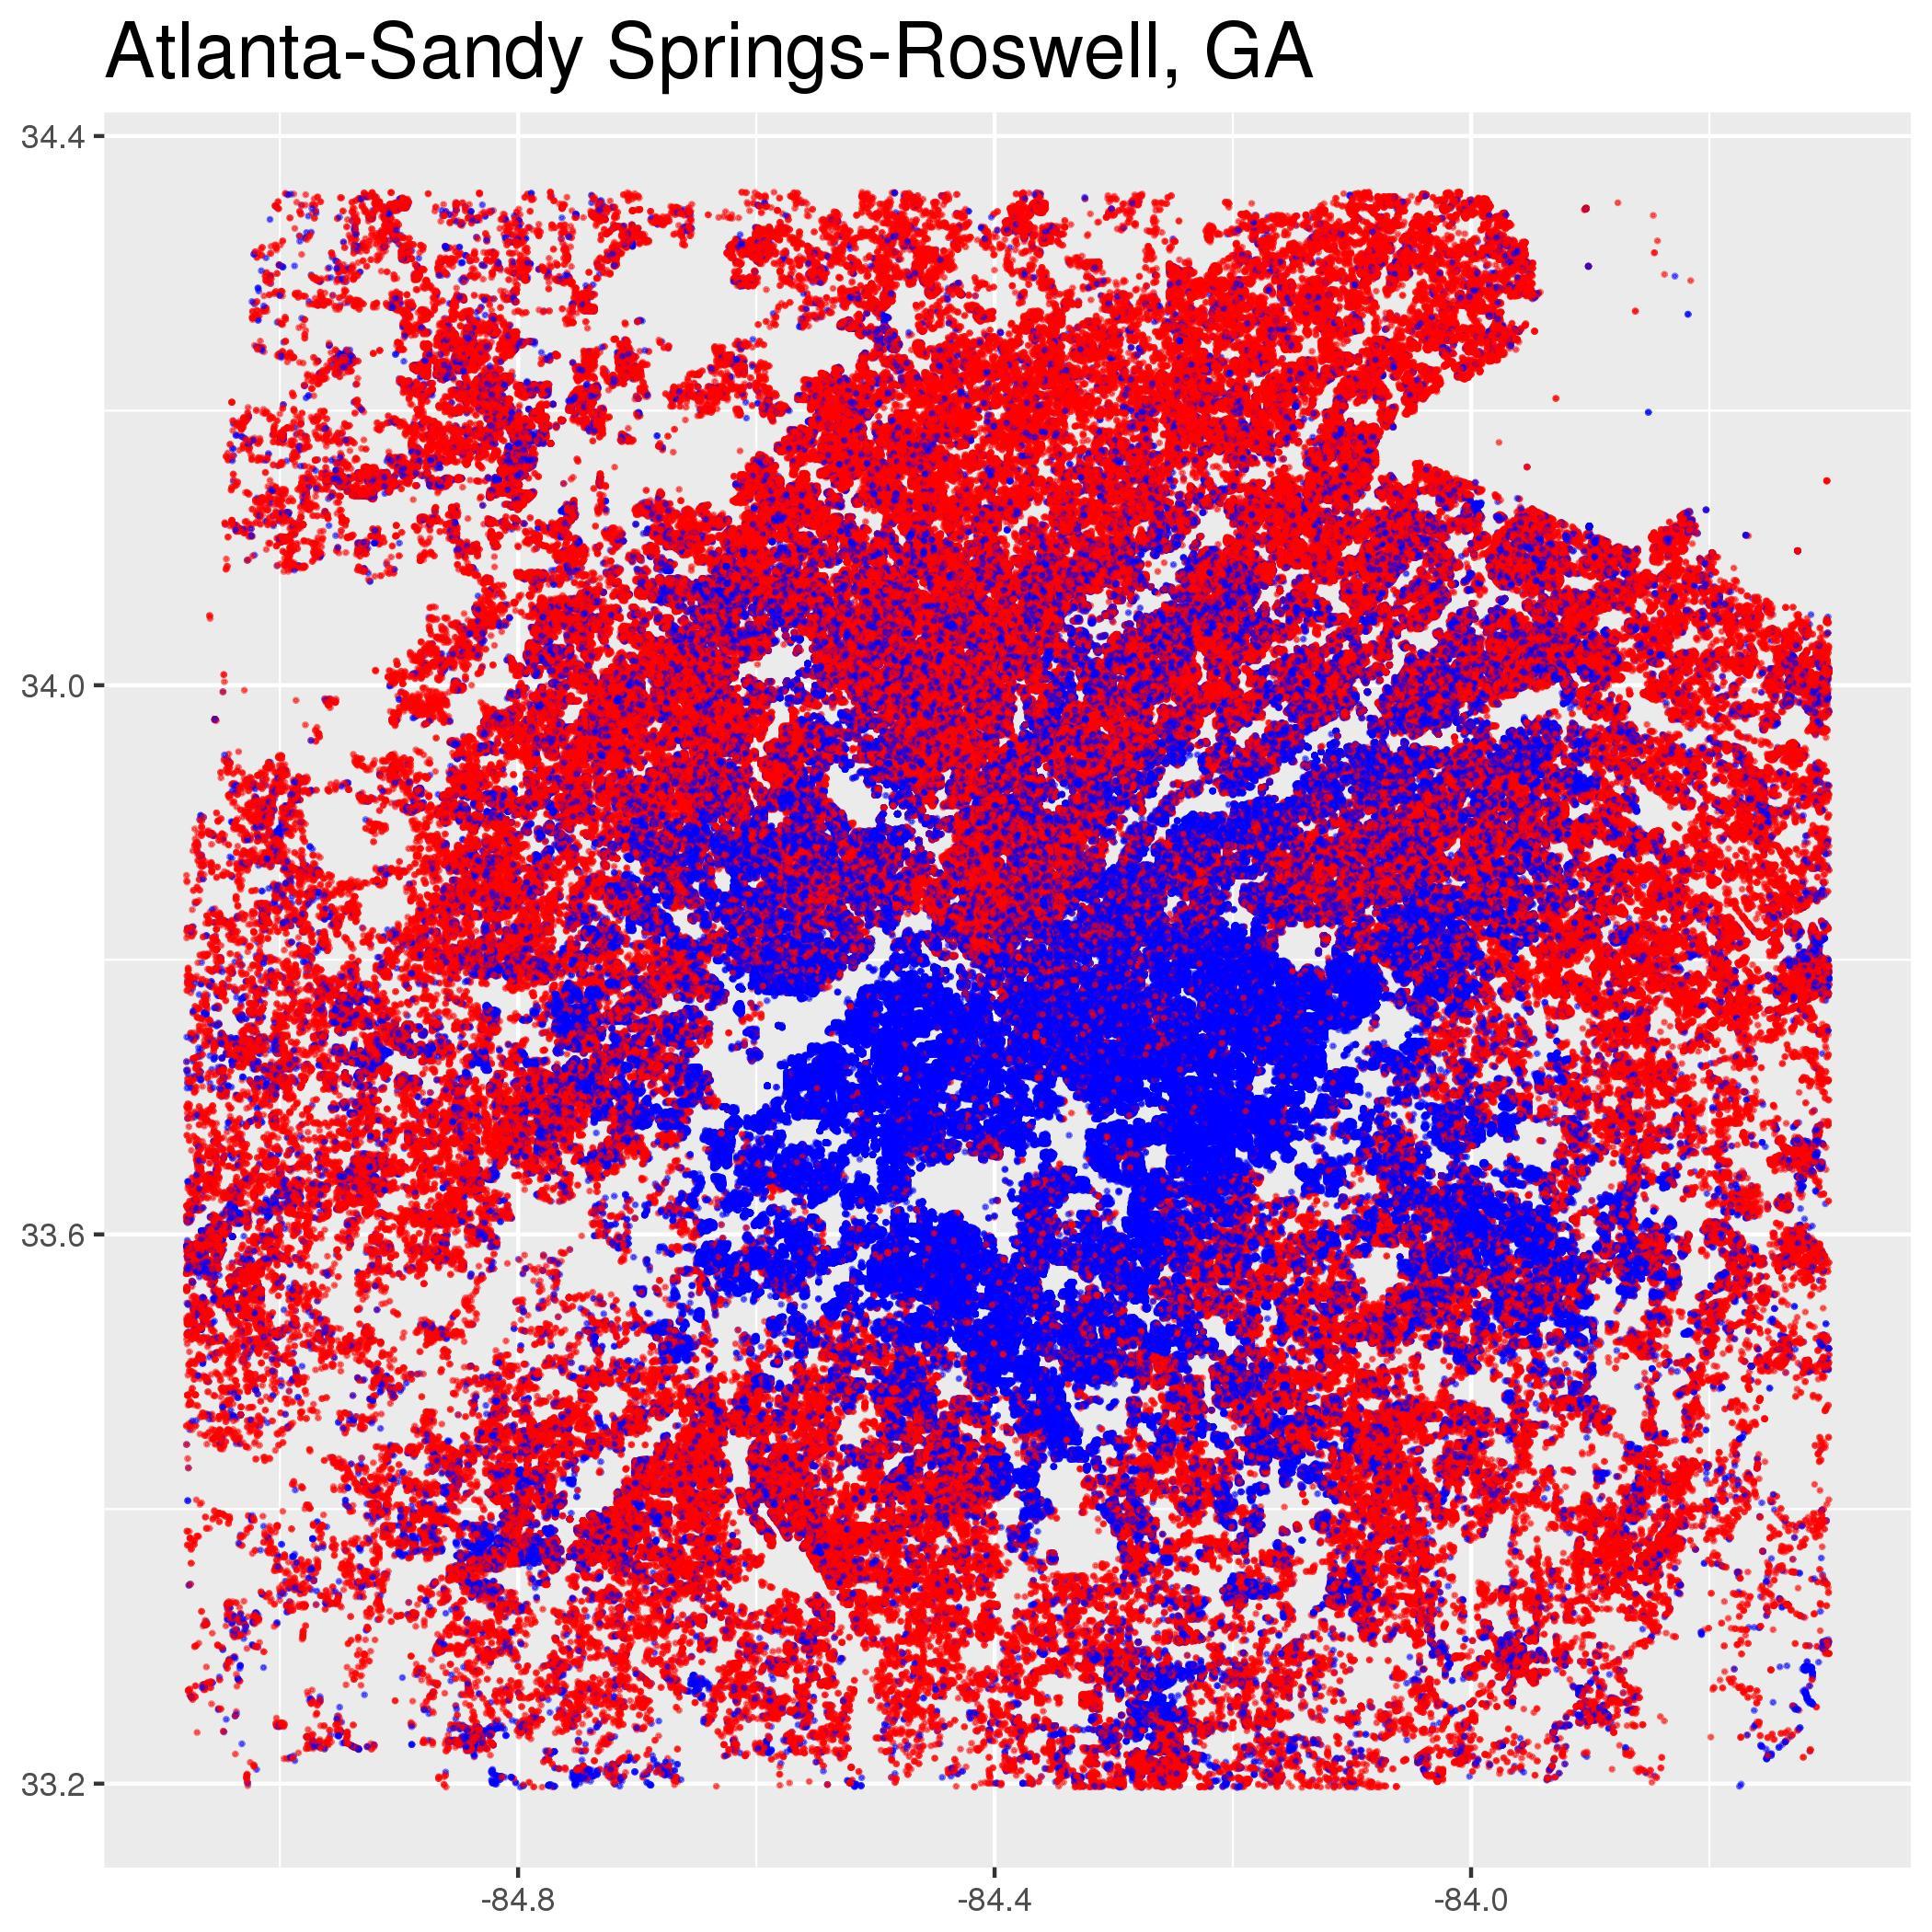 Atlanta-SandySprings-RoswellGA.jpeg